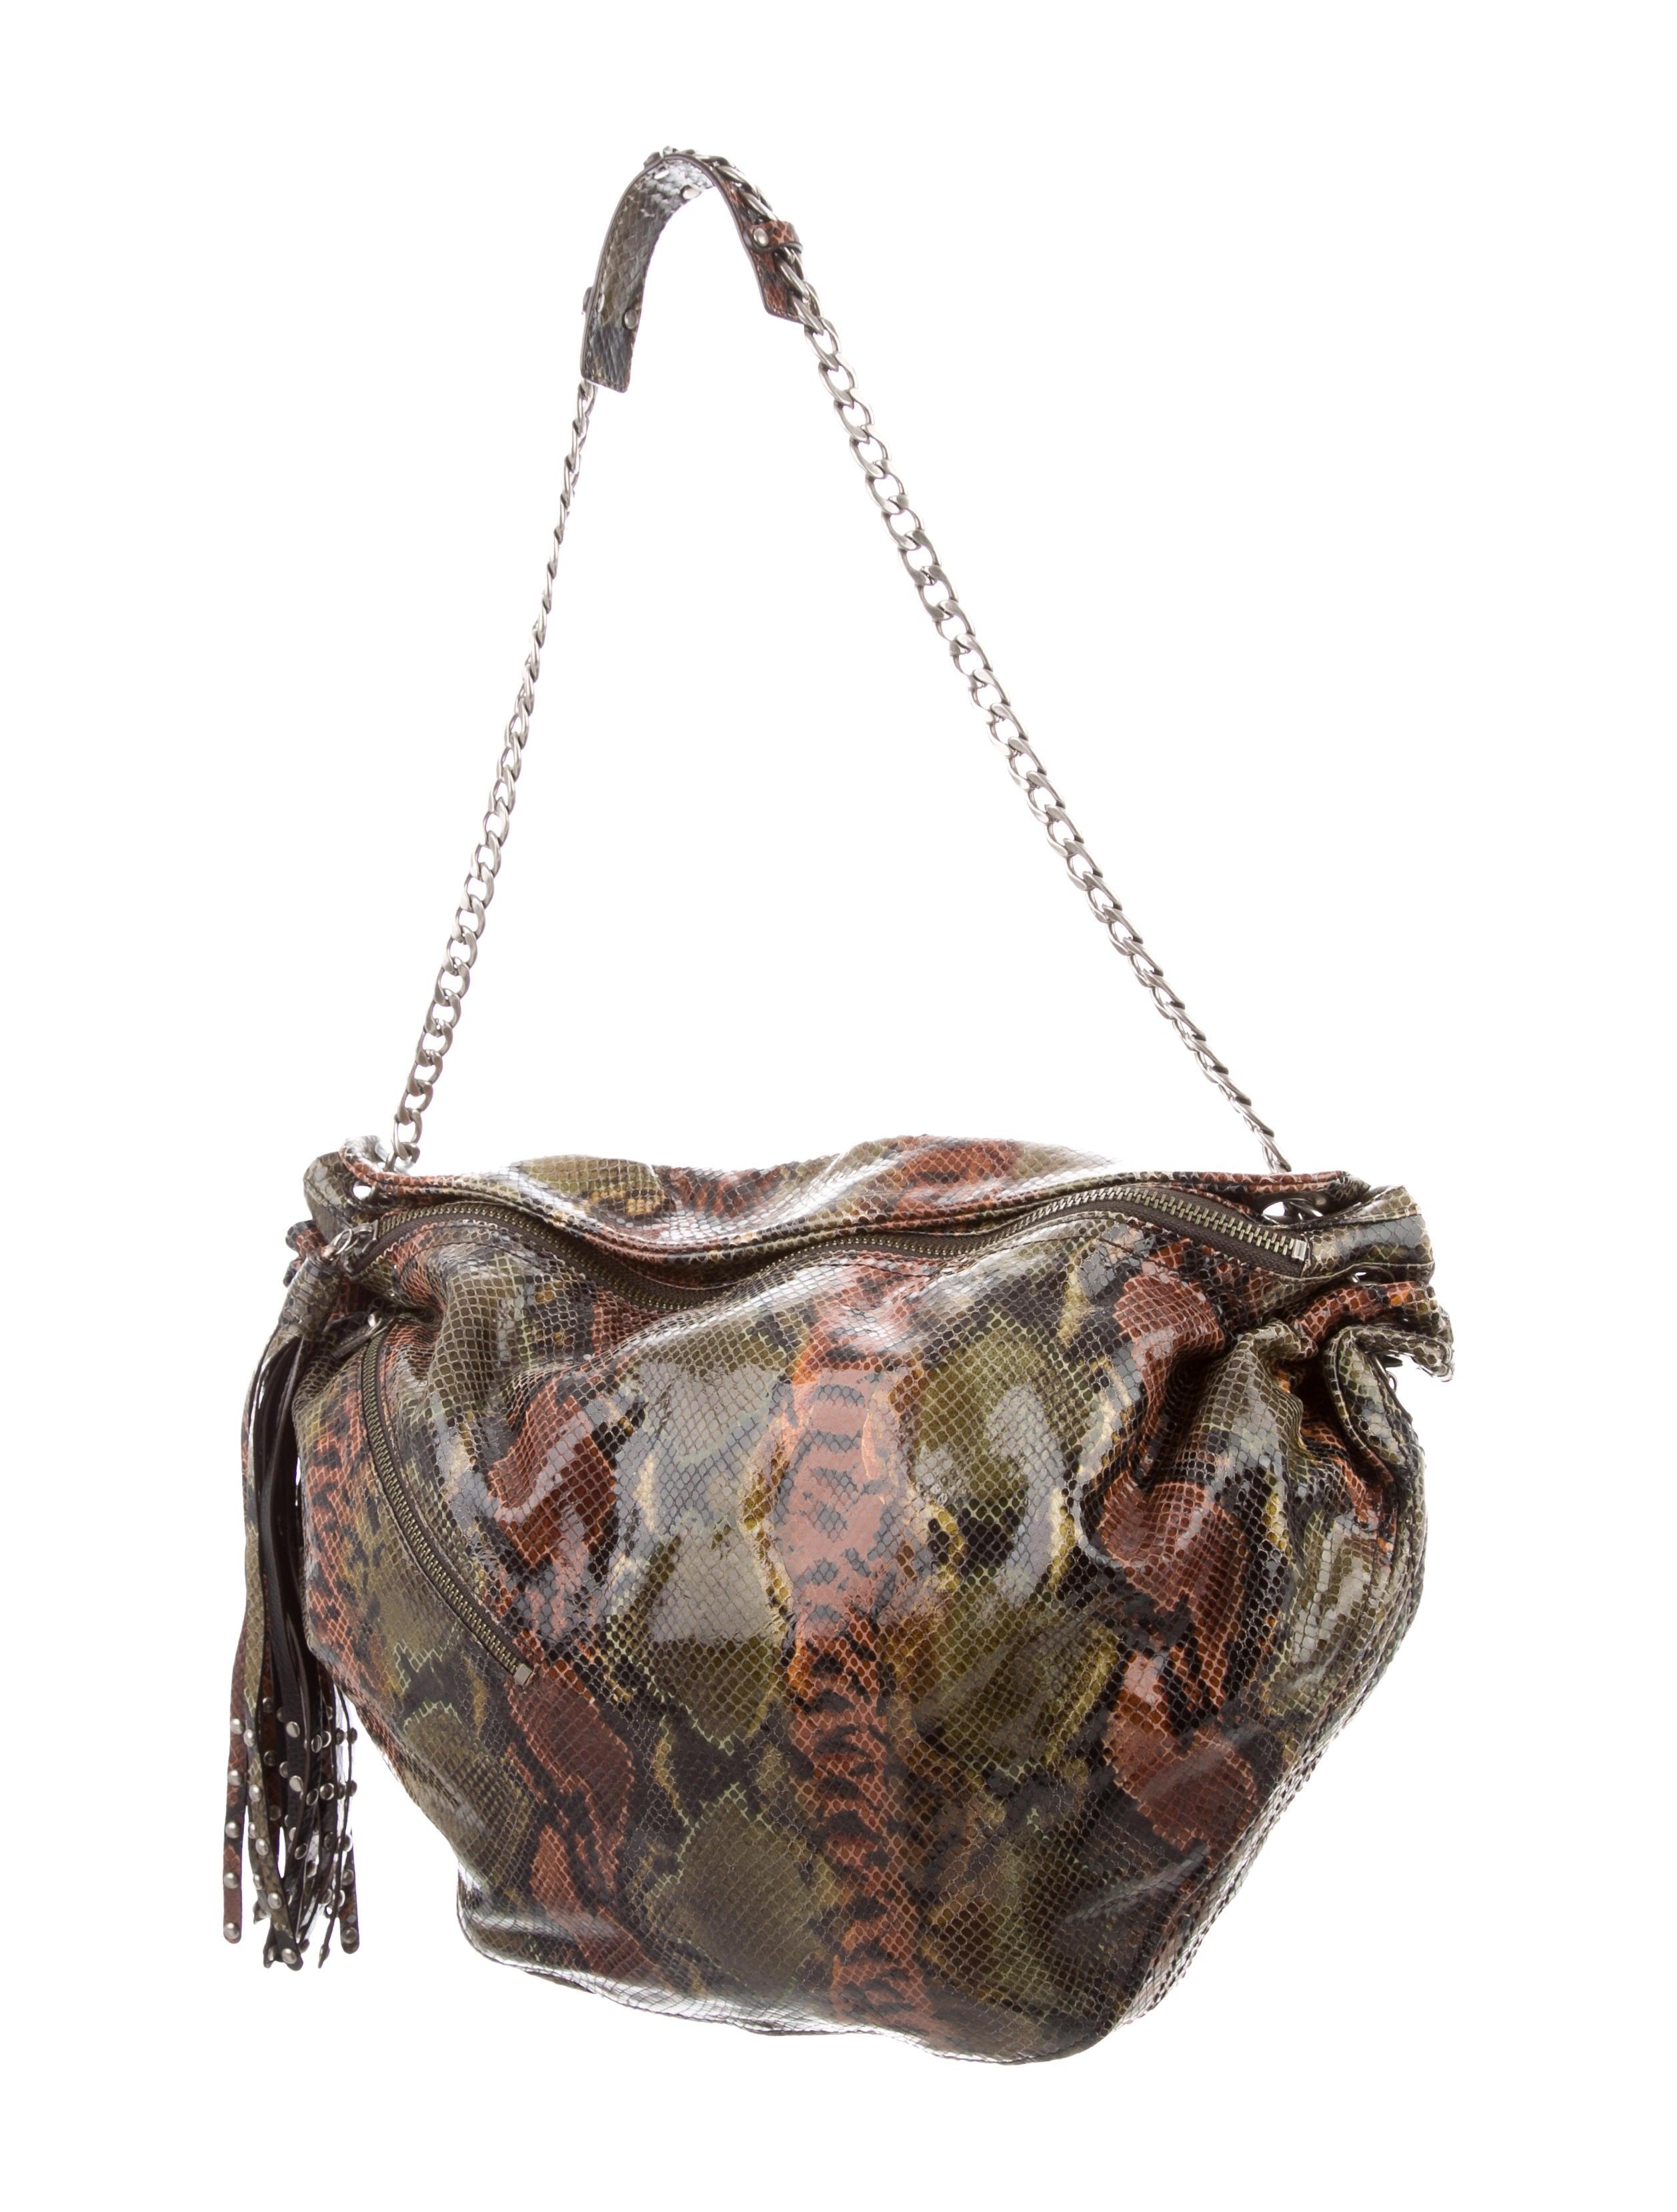 Botkier Embossed Shoulder Bag - Handbags